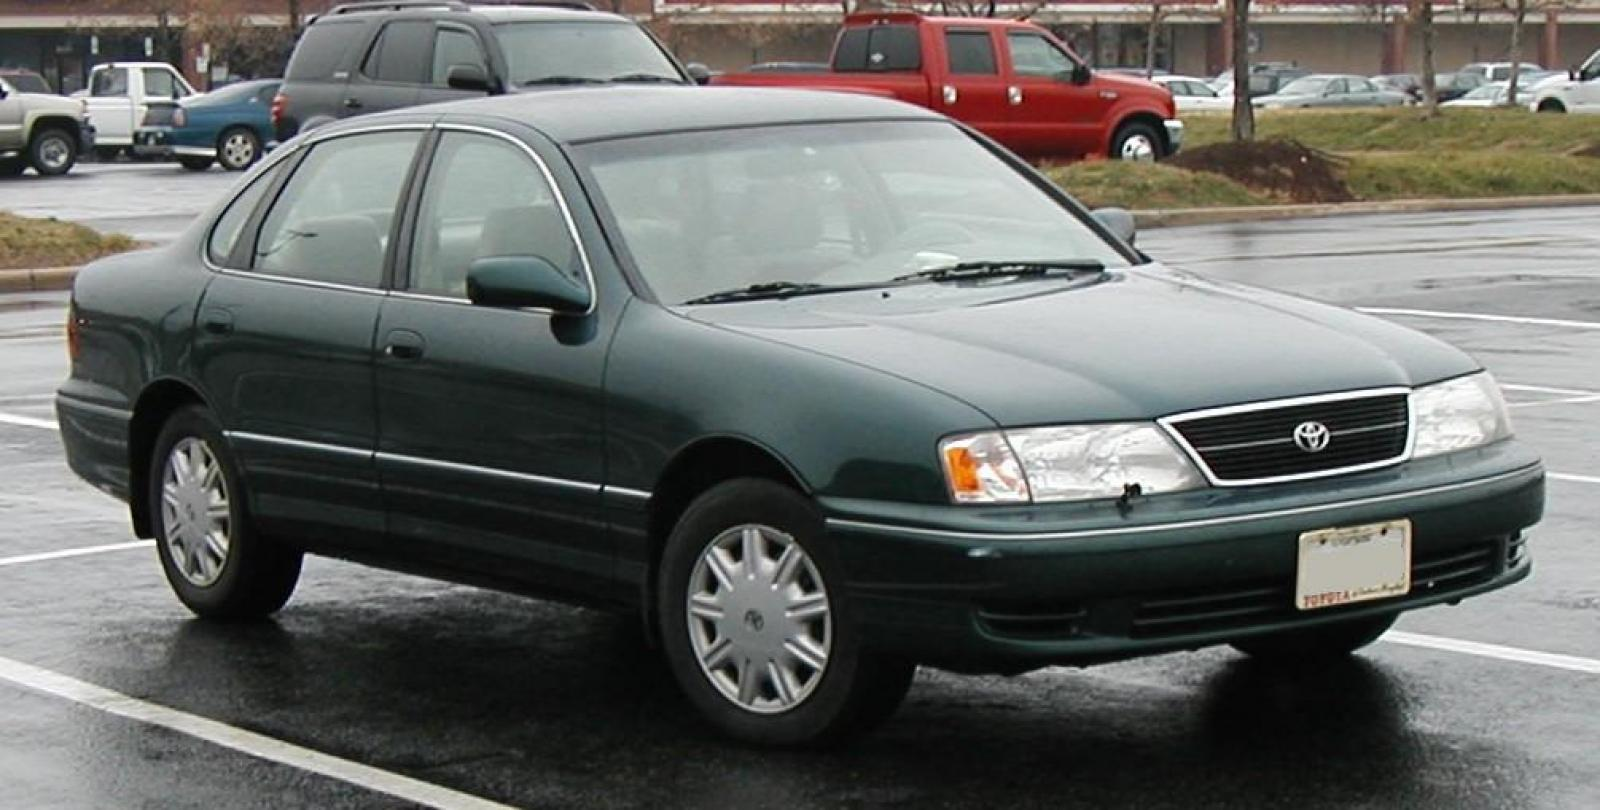 800 1024 1280 1600 origin 1998 Toyota Avalon ...